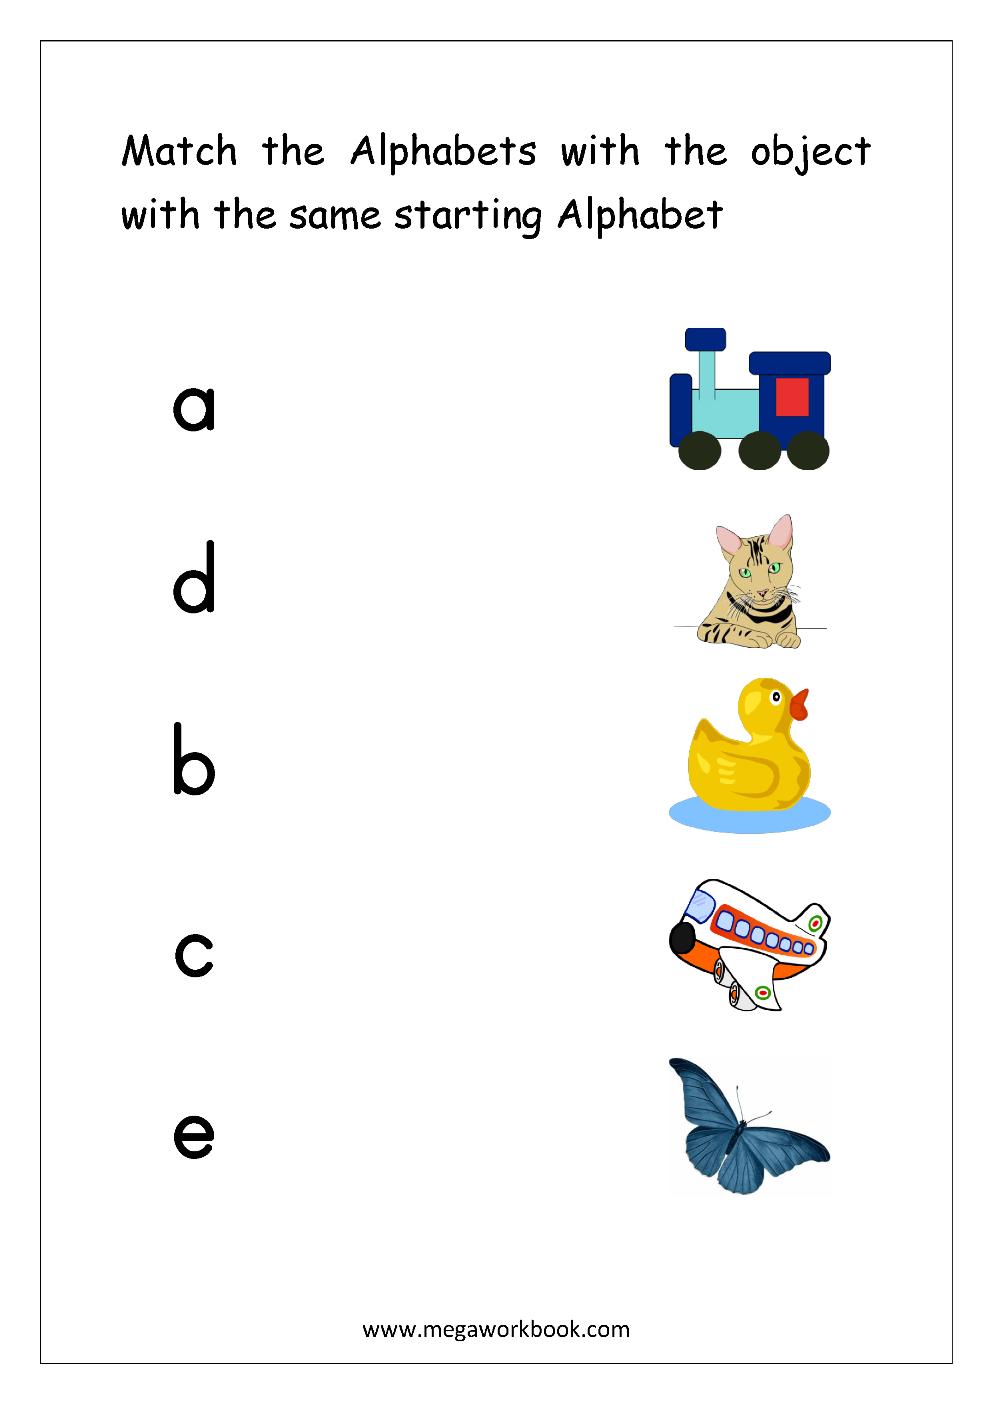 Free English Worksheets Alphabet Matching Megaworkbook Alphabet Matching English Worksheets For Kids Alphabet Pictures [ 1403 x 992 Pixel ]